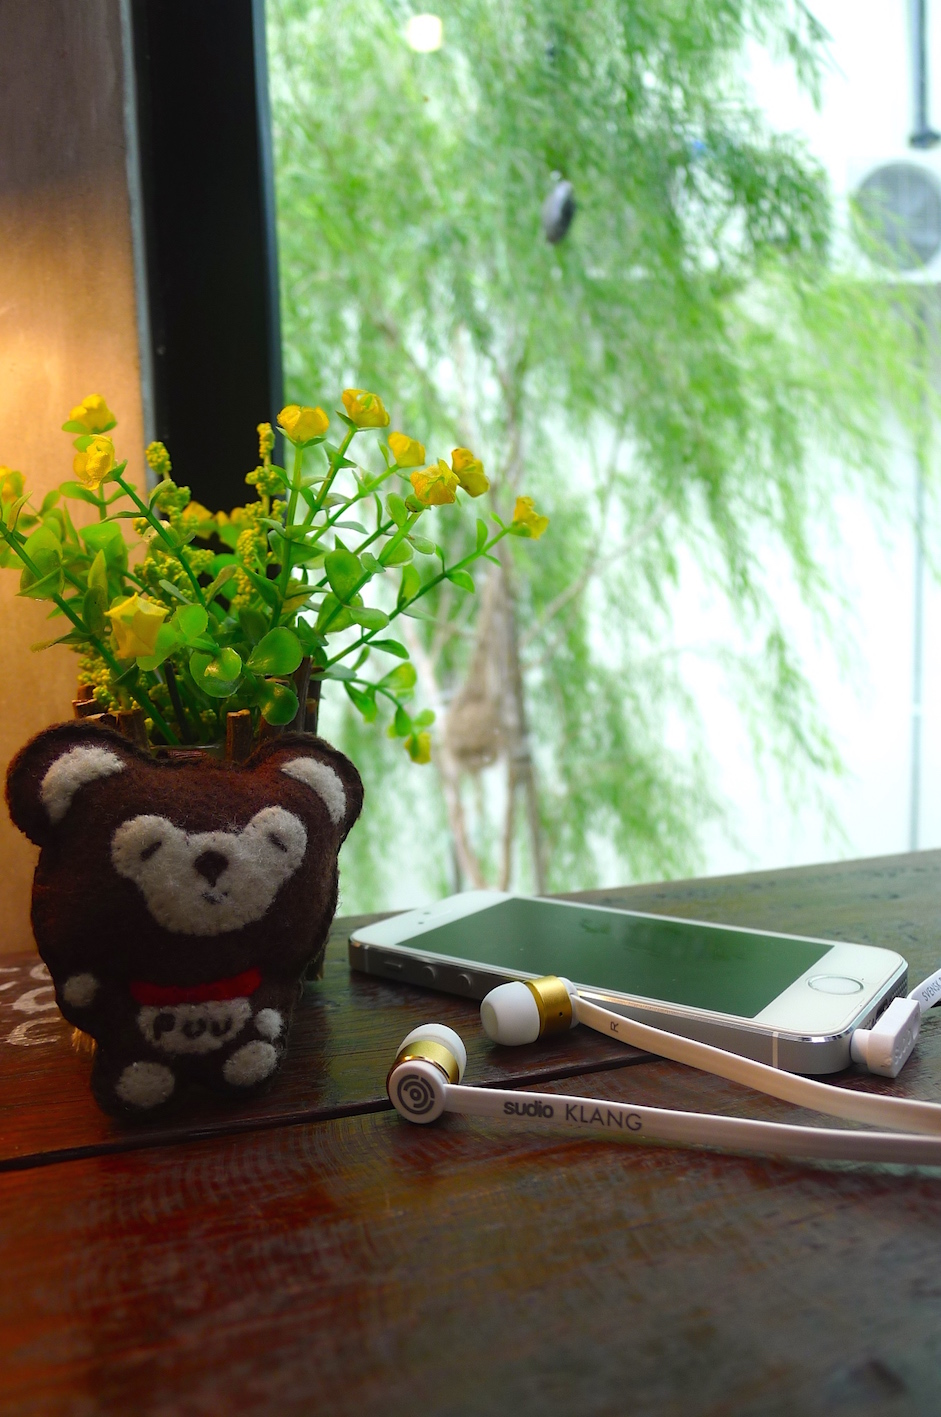 Sudio Klang 优雅质感耳机 - 聆听世界的声音 2F+ Coffee By Yellow House